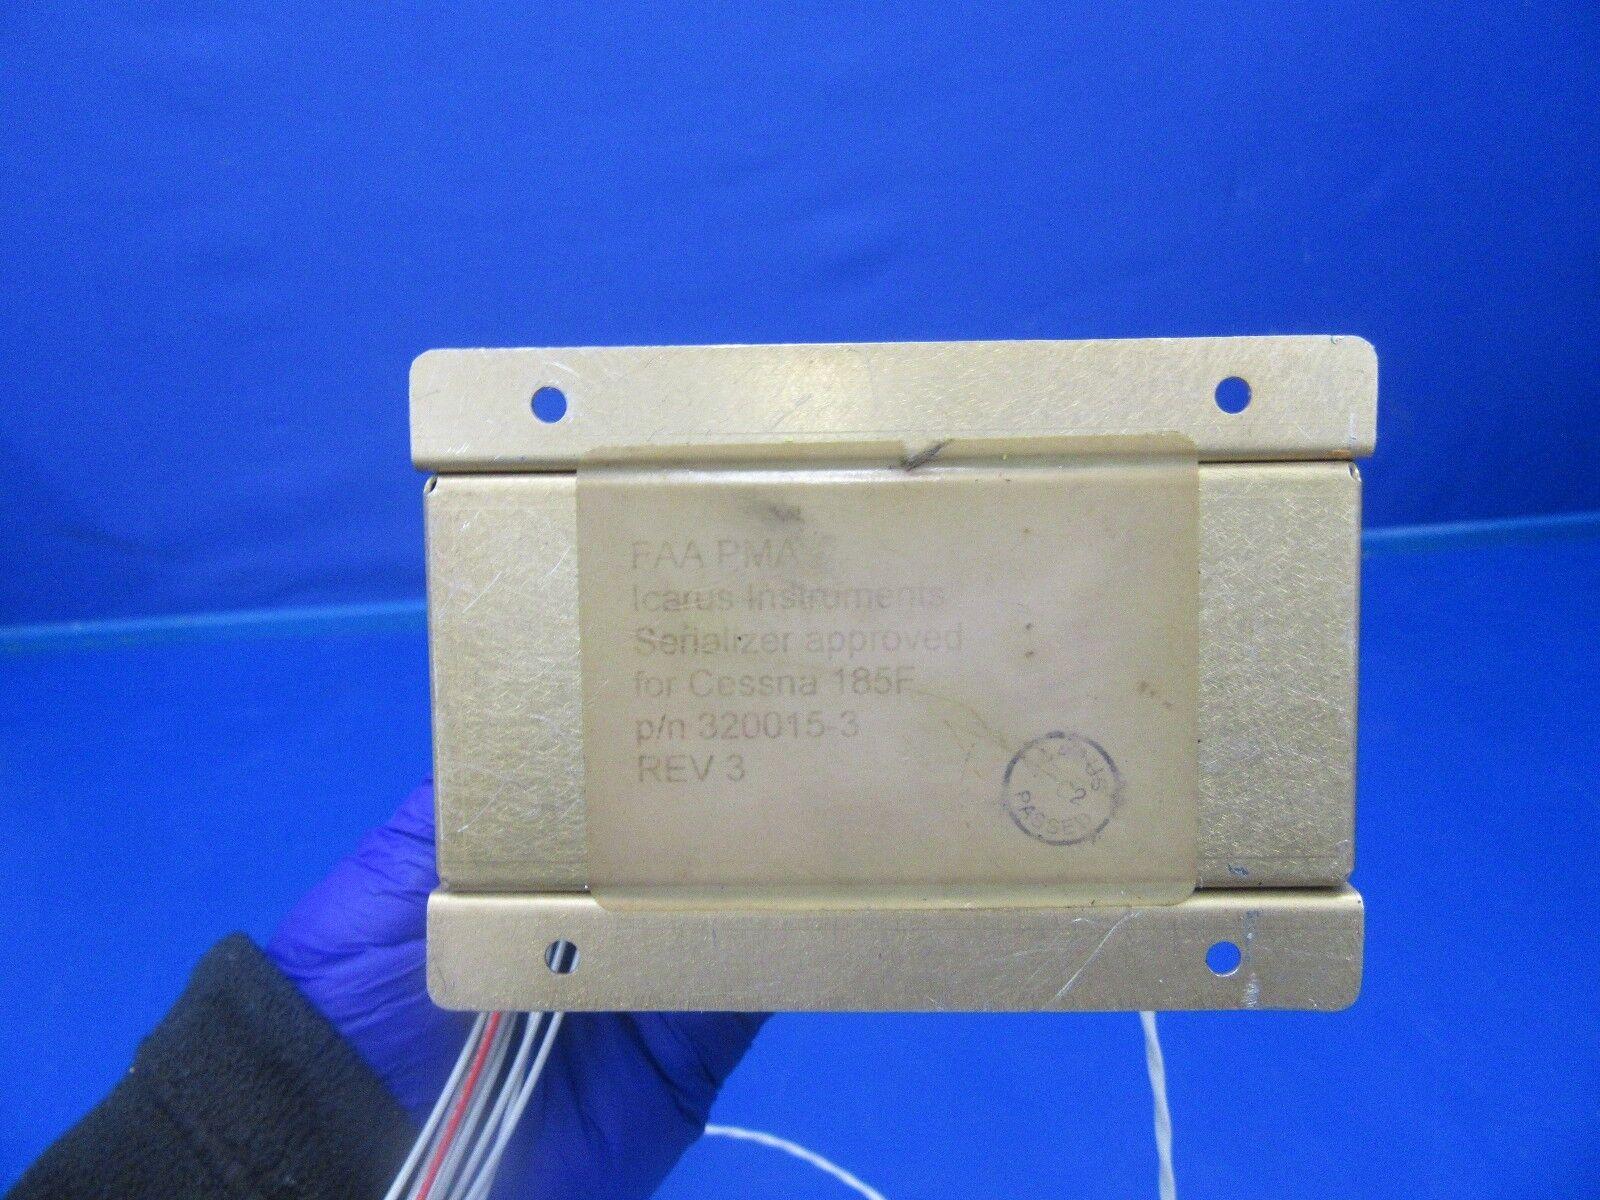 Icarus 3000U Mode C Serializer P/N 3230015-3 (0318-170)